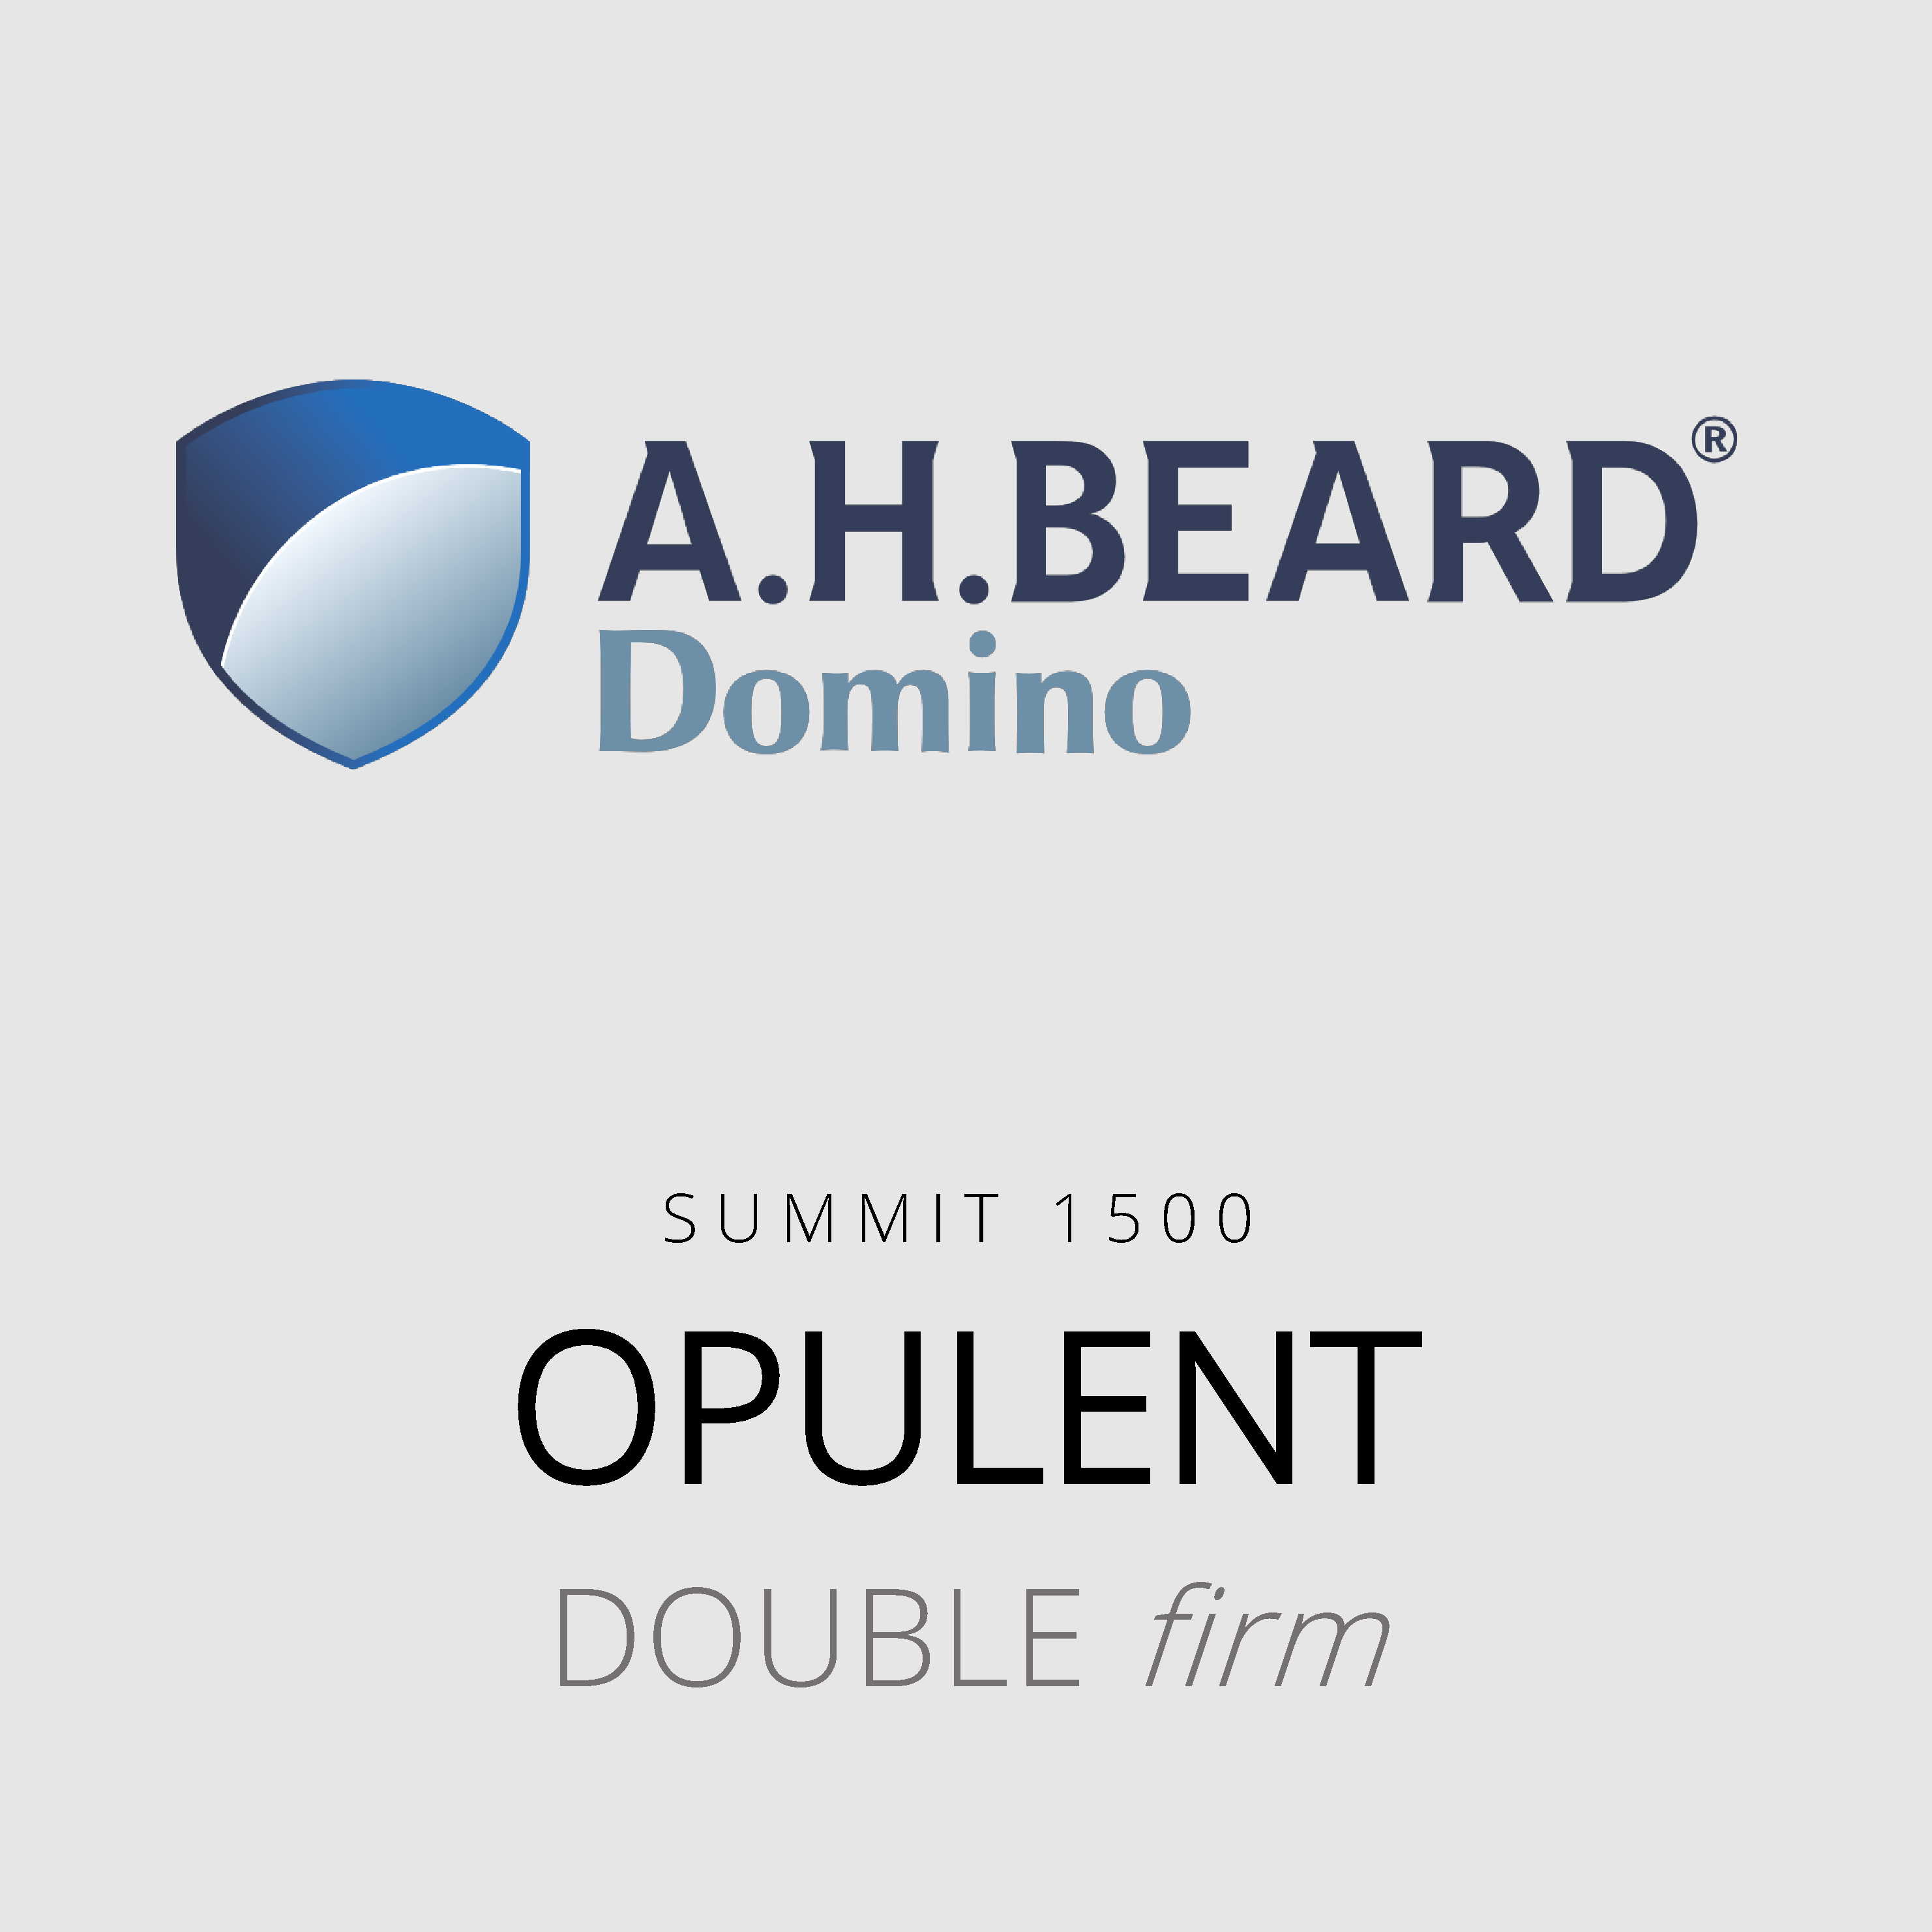 AH Beard Domino – Opulent – Summit 1500 – Double Firm Mattress